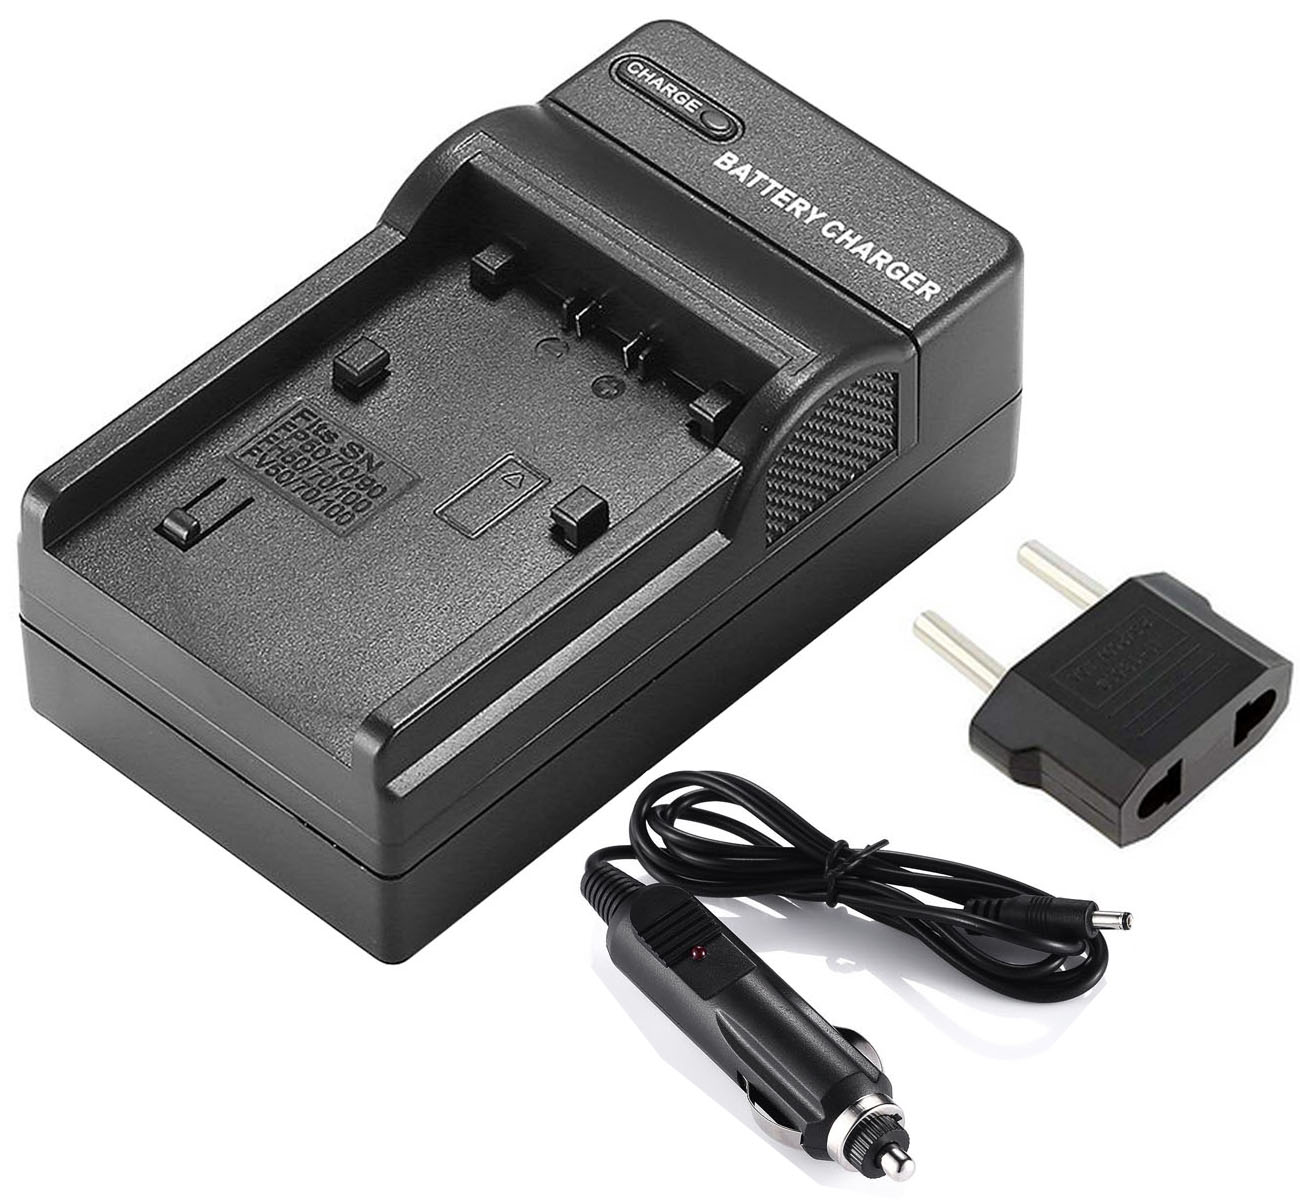 Videocámara batería-cargador Micro USB para Sony CyberShot dsc-hx100 V